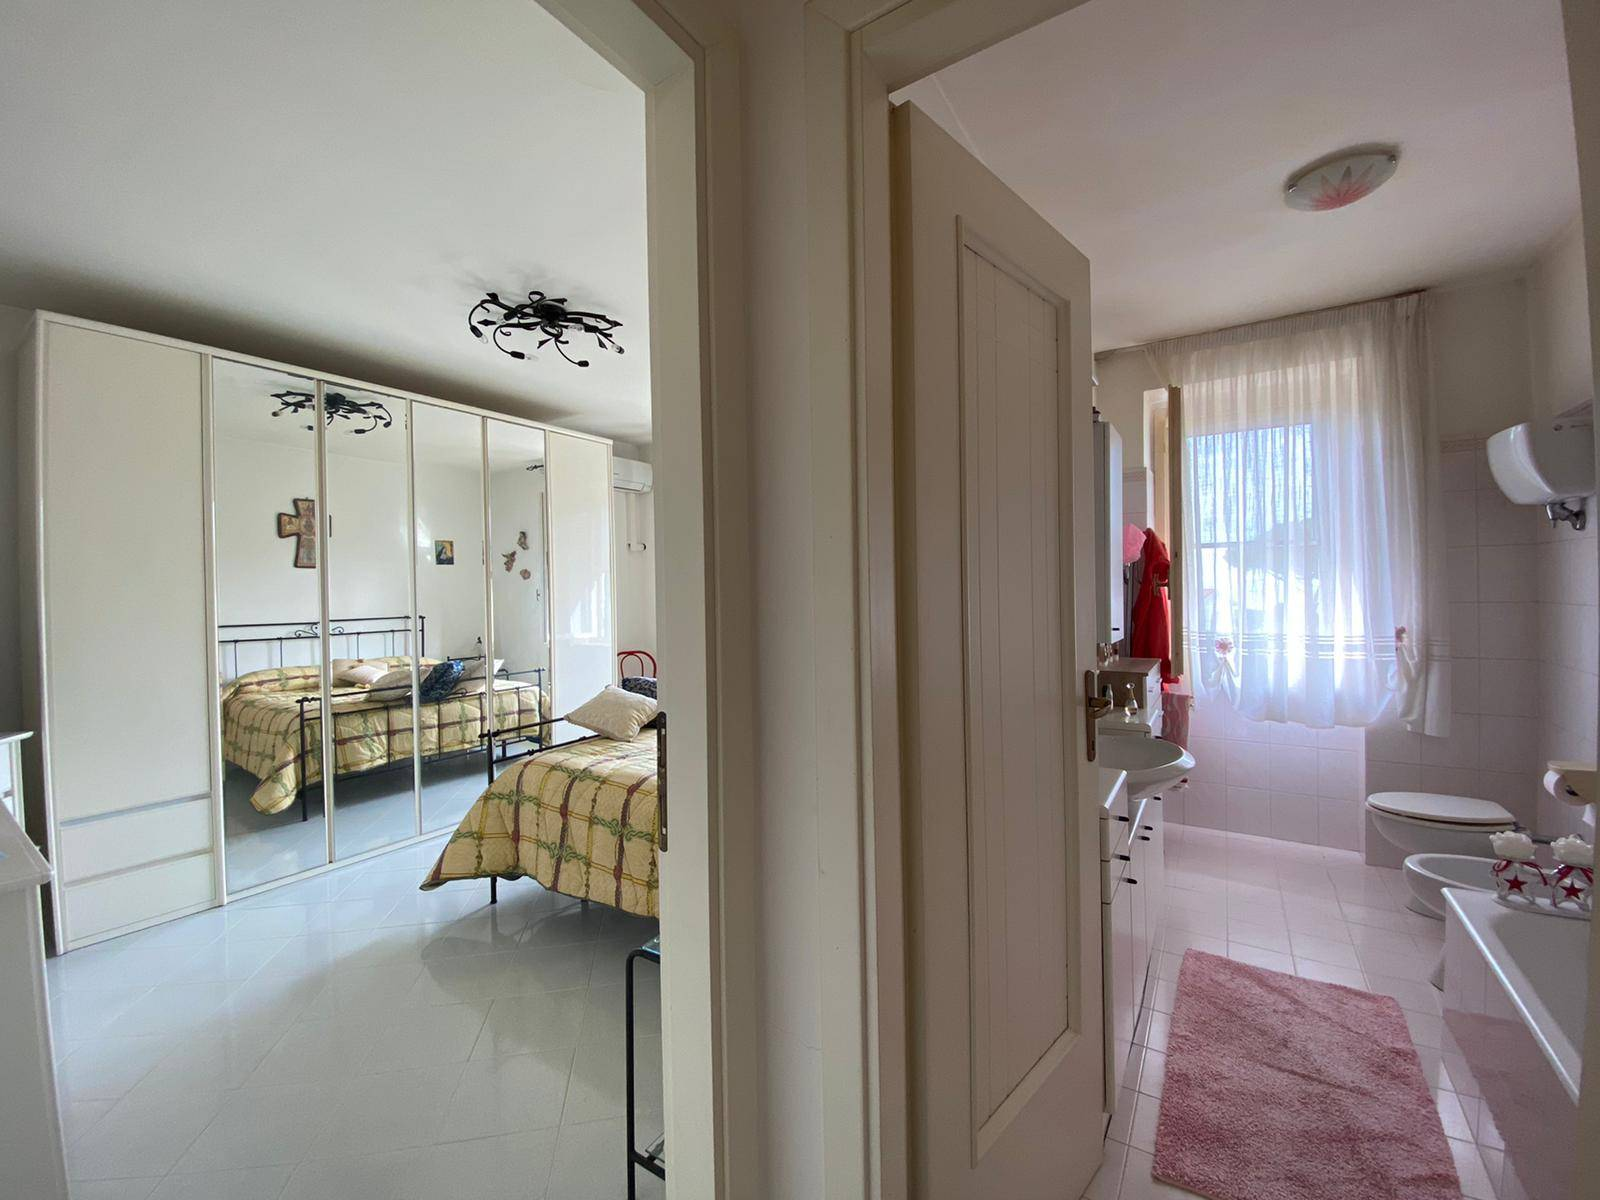 ingresso bagno e camera